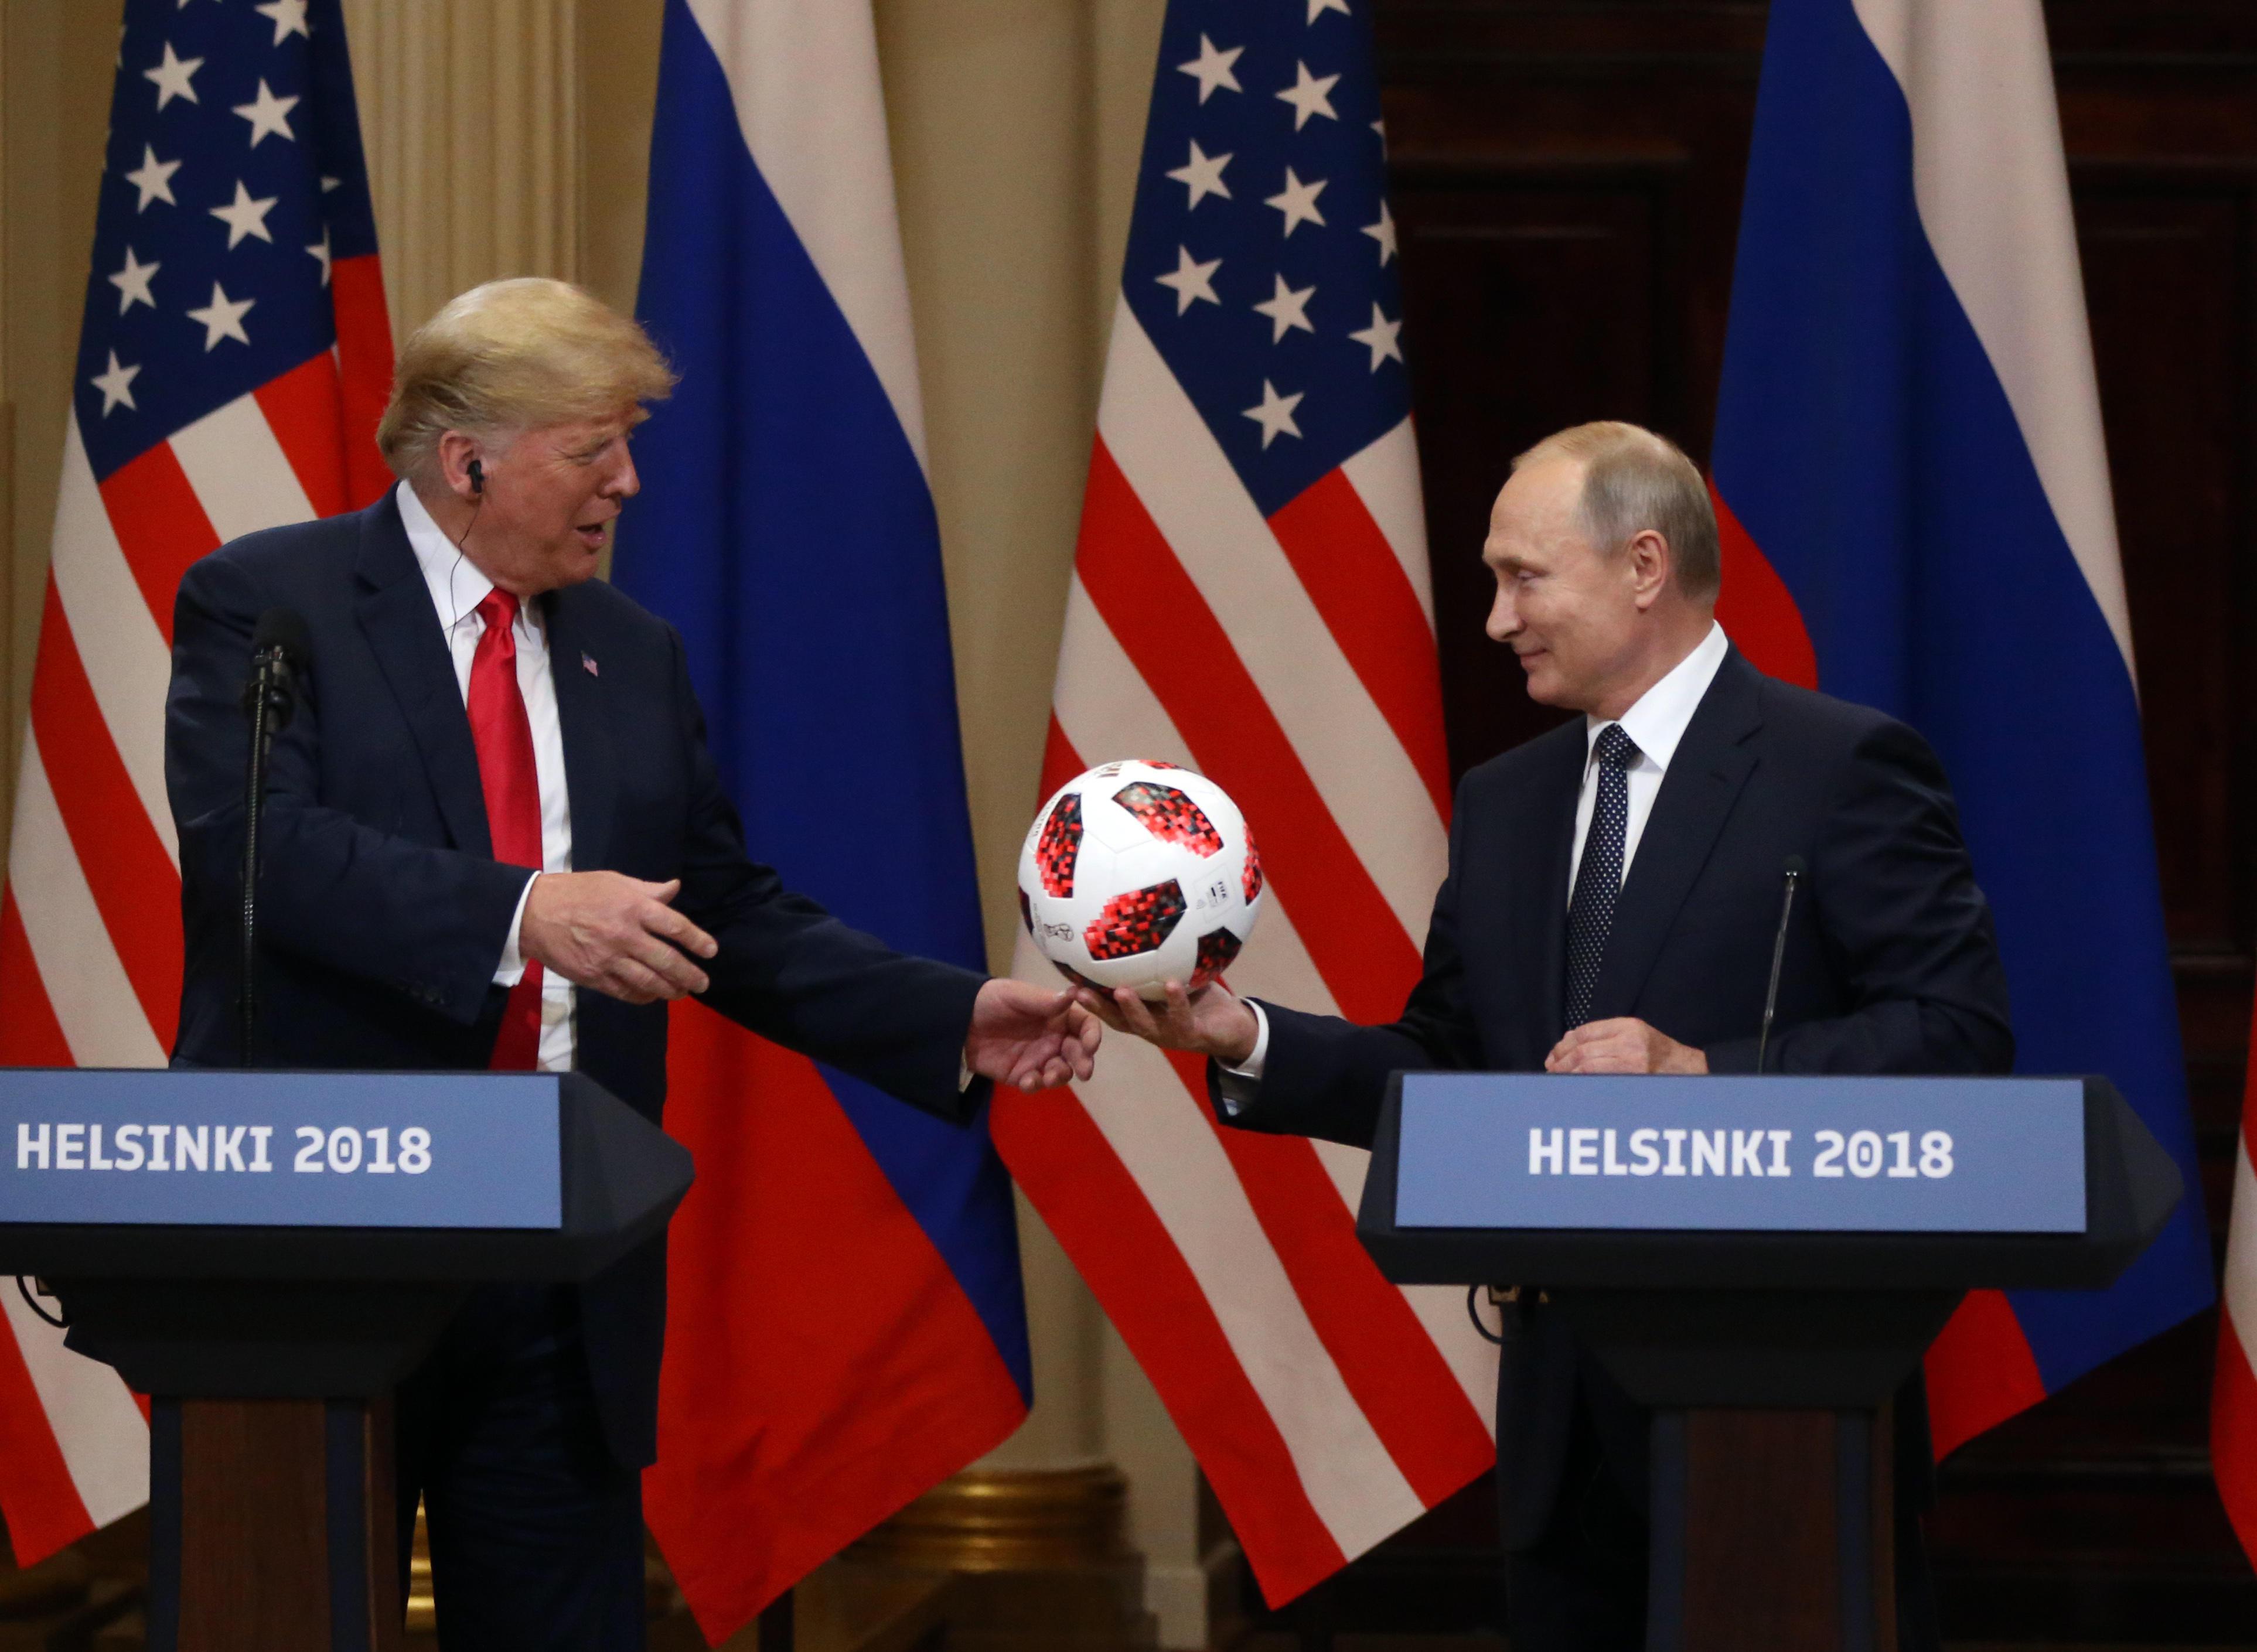 76eb79186 Vladimir Putin's soccer ball gift to Trump may have had microchip ...